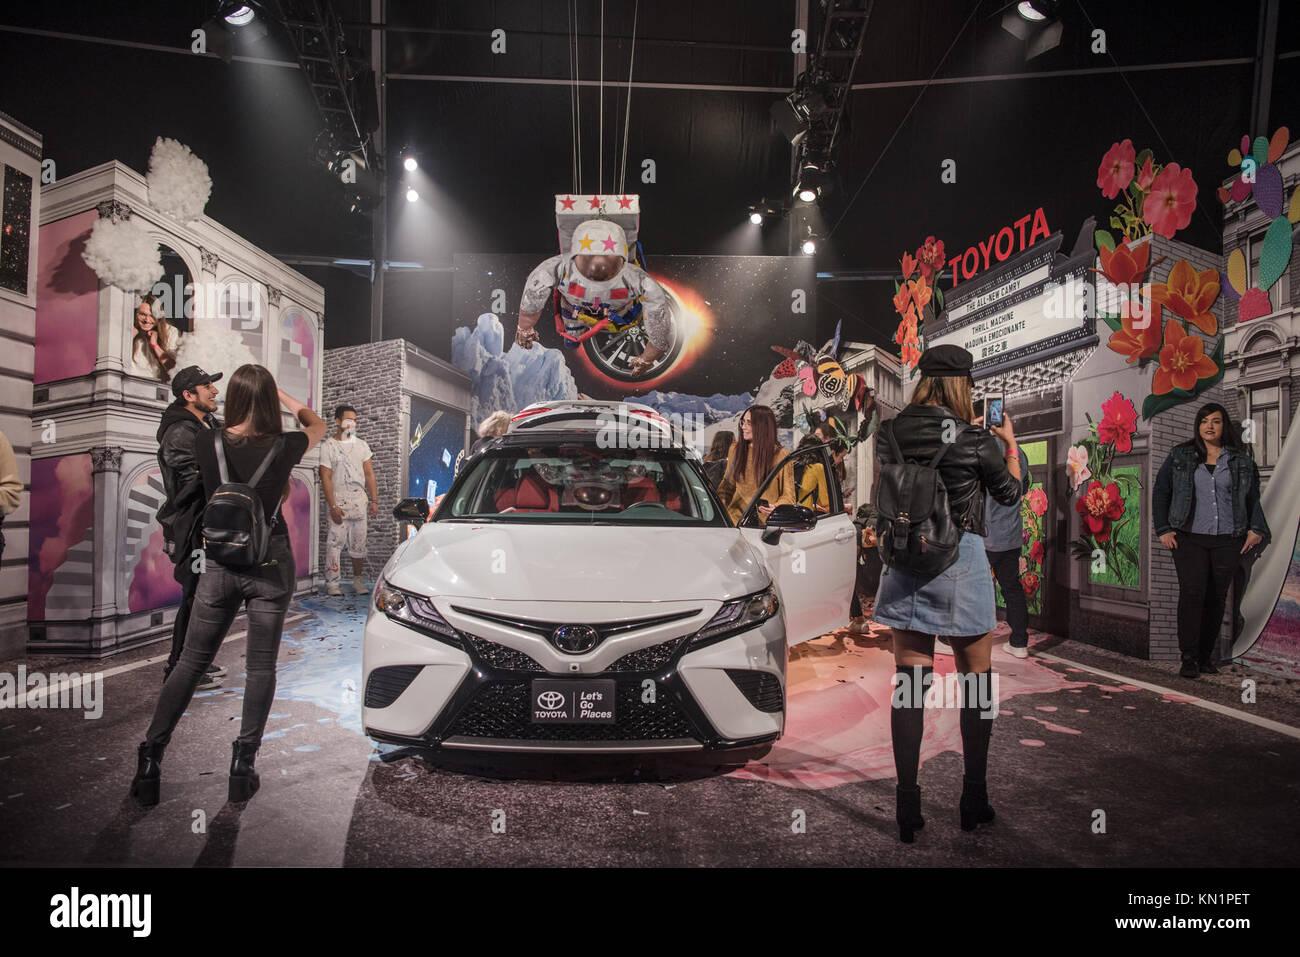 A Toyota Sponsored Art Installation At U0027u002729 Roomsu0027u0027 In Downtown Los Angeles,  California. Credit: Morgan Lieberman/ZUMA Wire/Alamy Live News